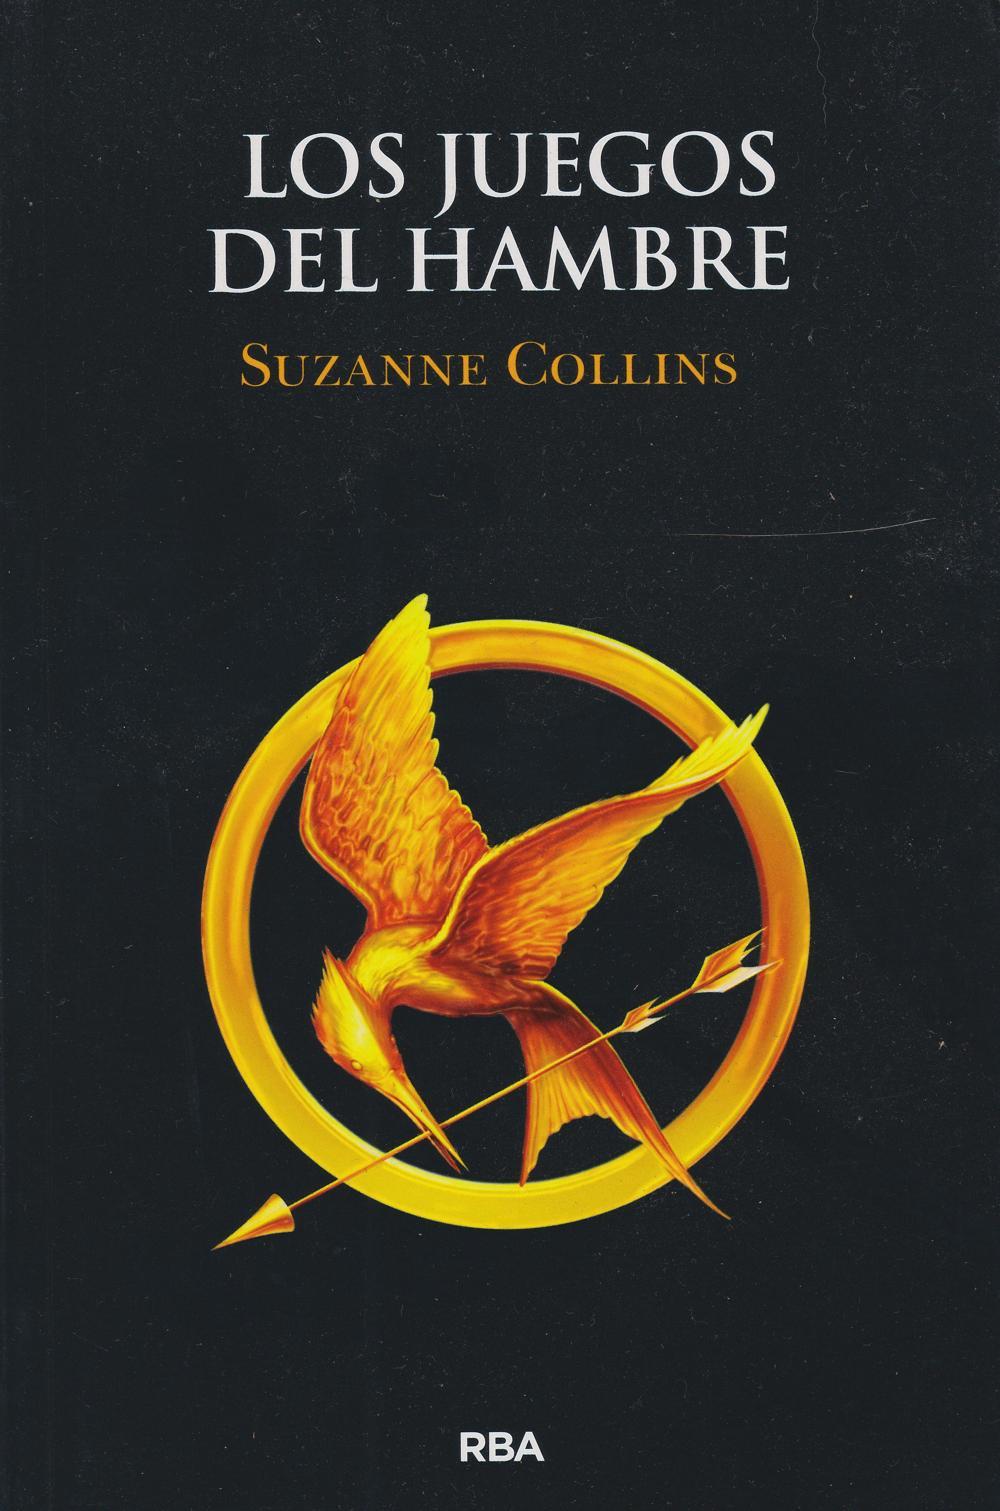 Hunger Games Collection, Rey Del Sol, Del Sol Books, Del Sol University